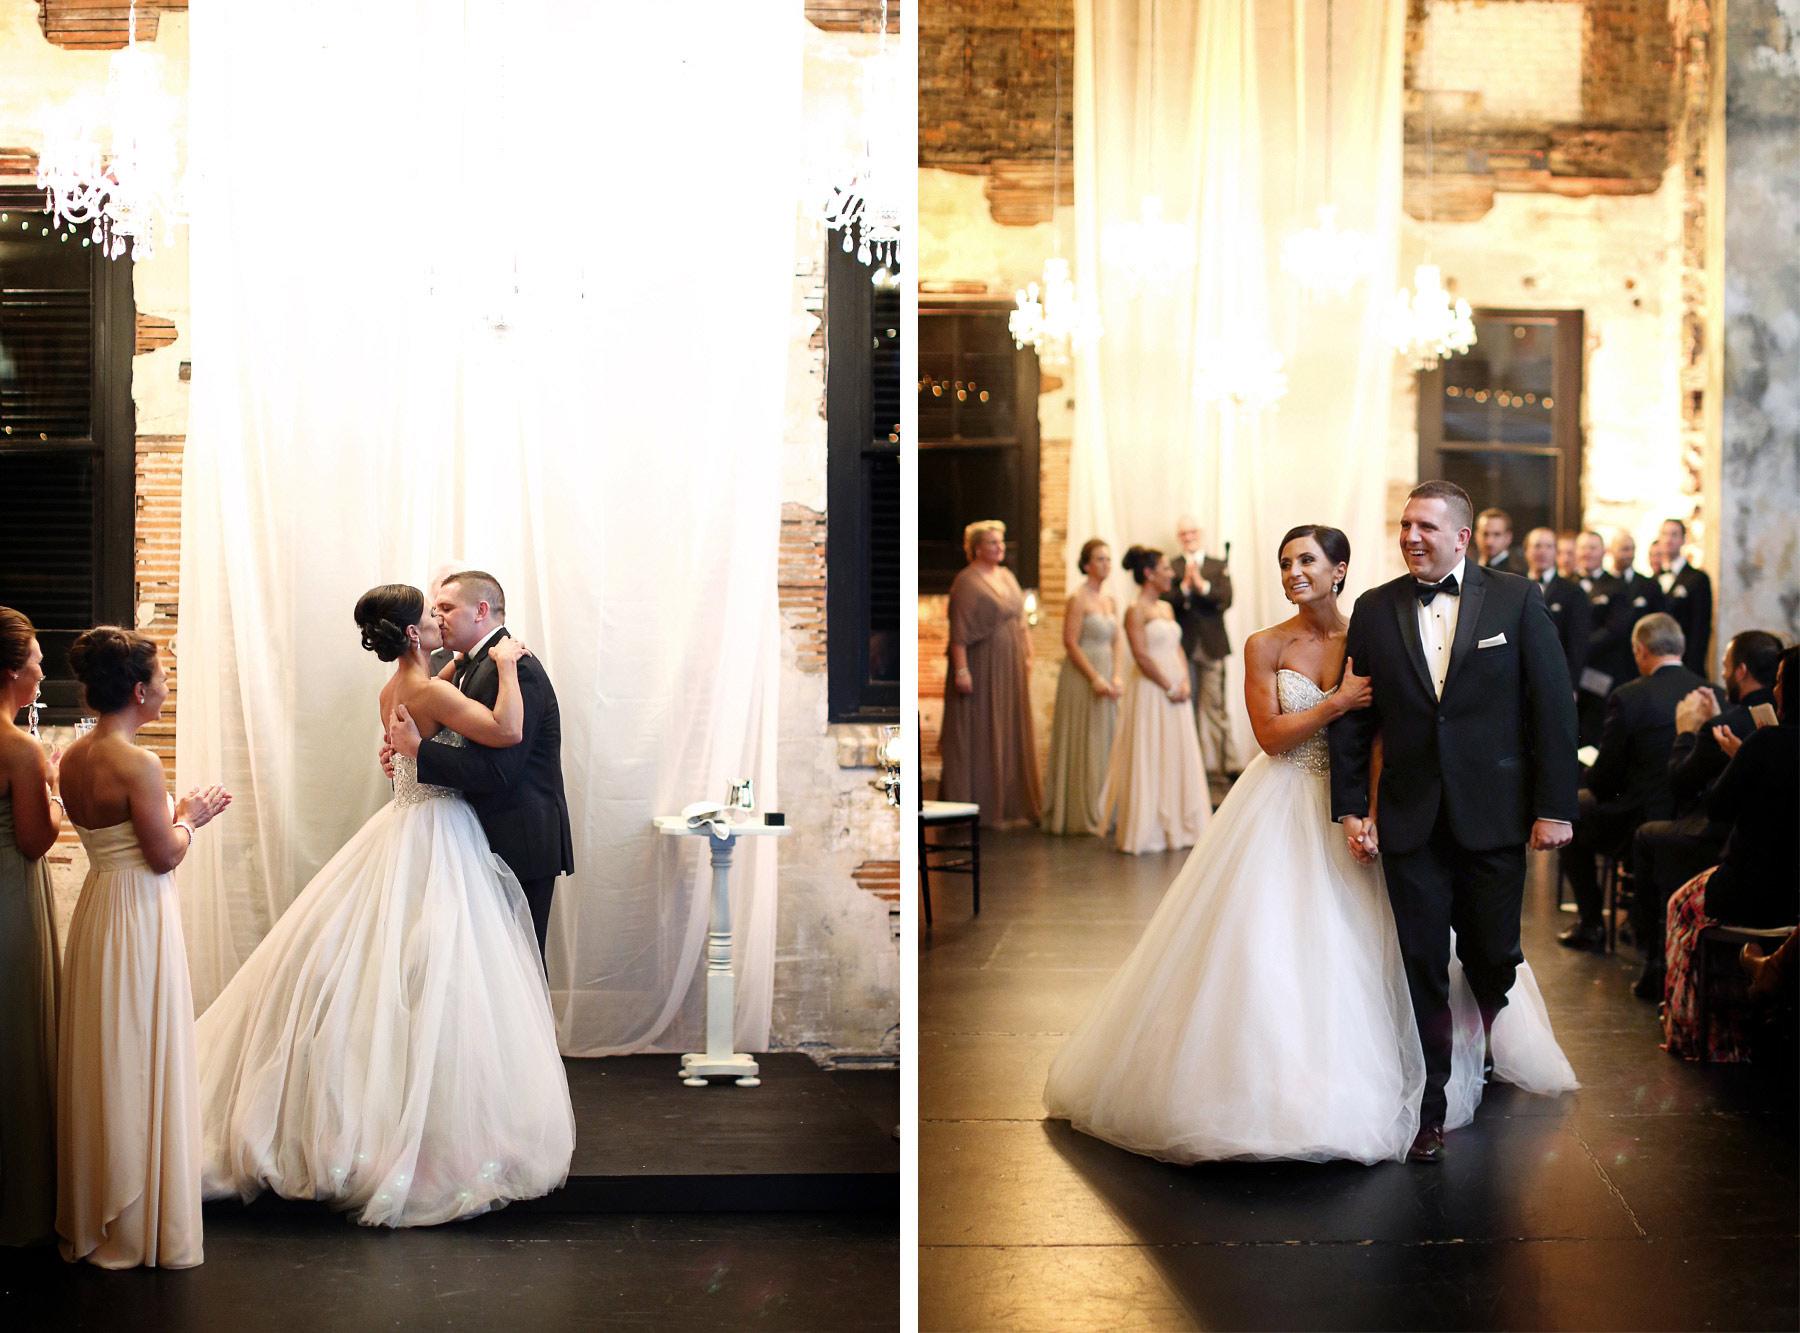 13-Minneapolis-Minnesota-Wedding-Photography-Aria-Downtown-Industrial-Ceremony-Melanie-and-Andrew.jpg